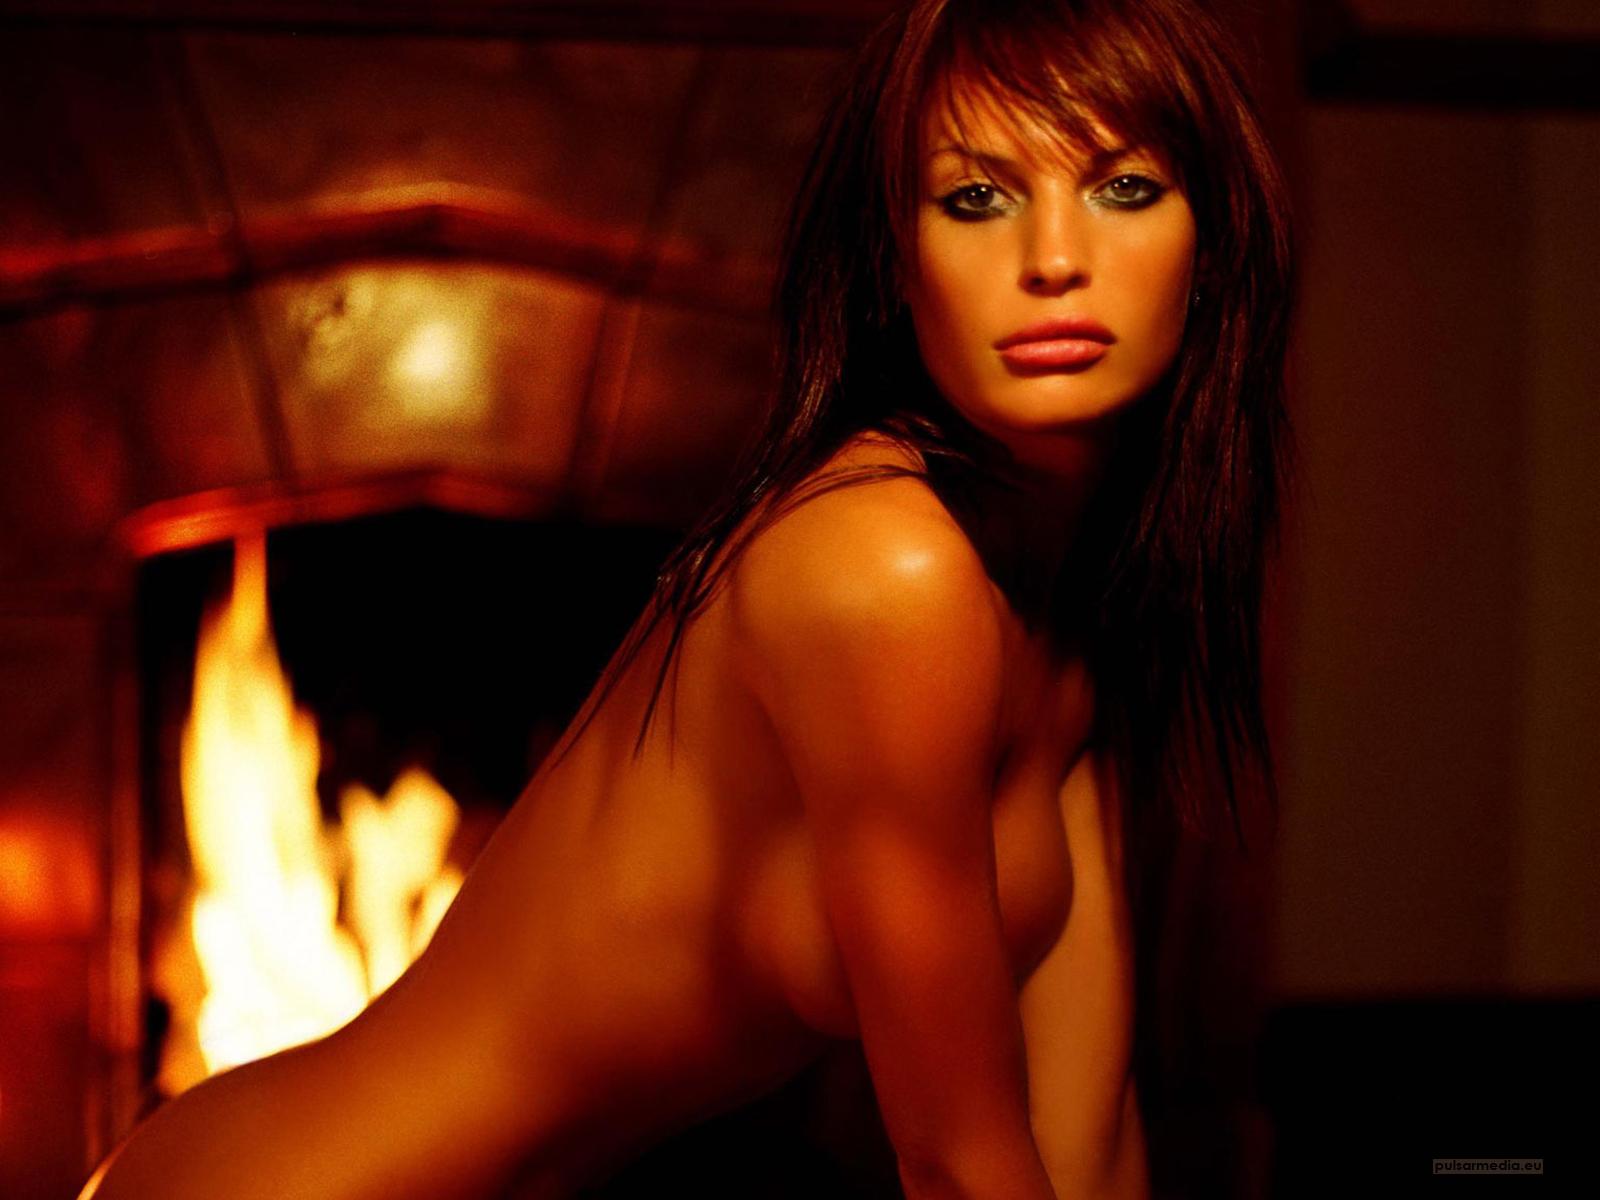 Hot ass jolene blalock nude 70 Hot Pictures Of Jolene Blalock T Pol Of Star Trek Enterprise Top Sexy Models